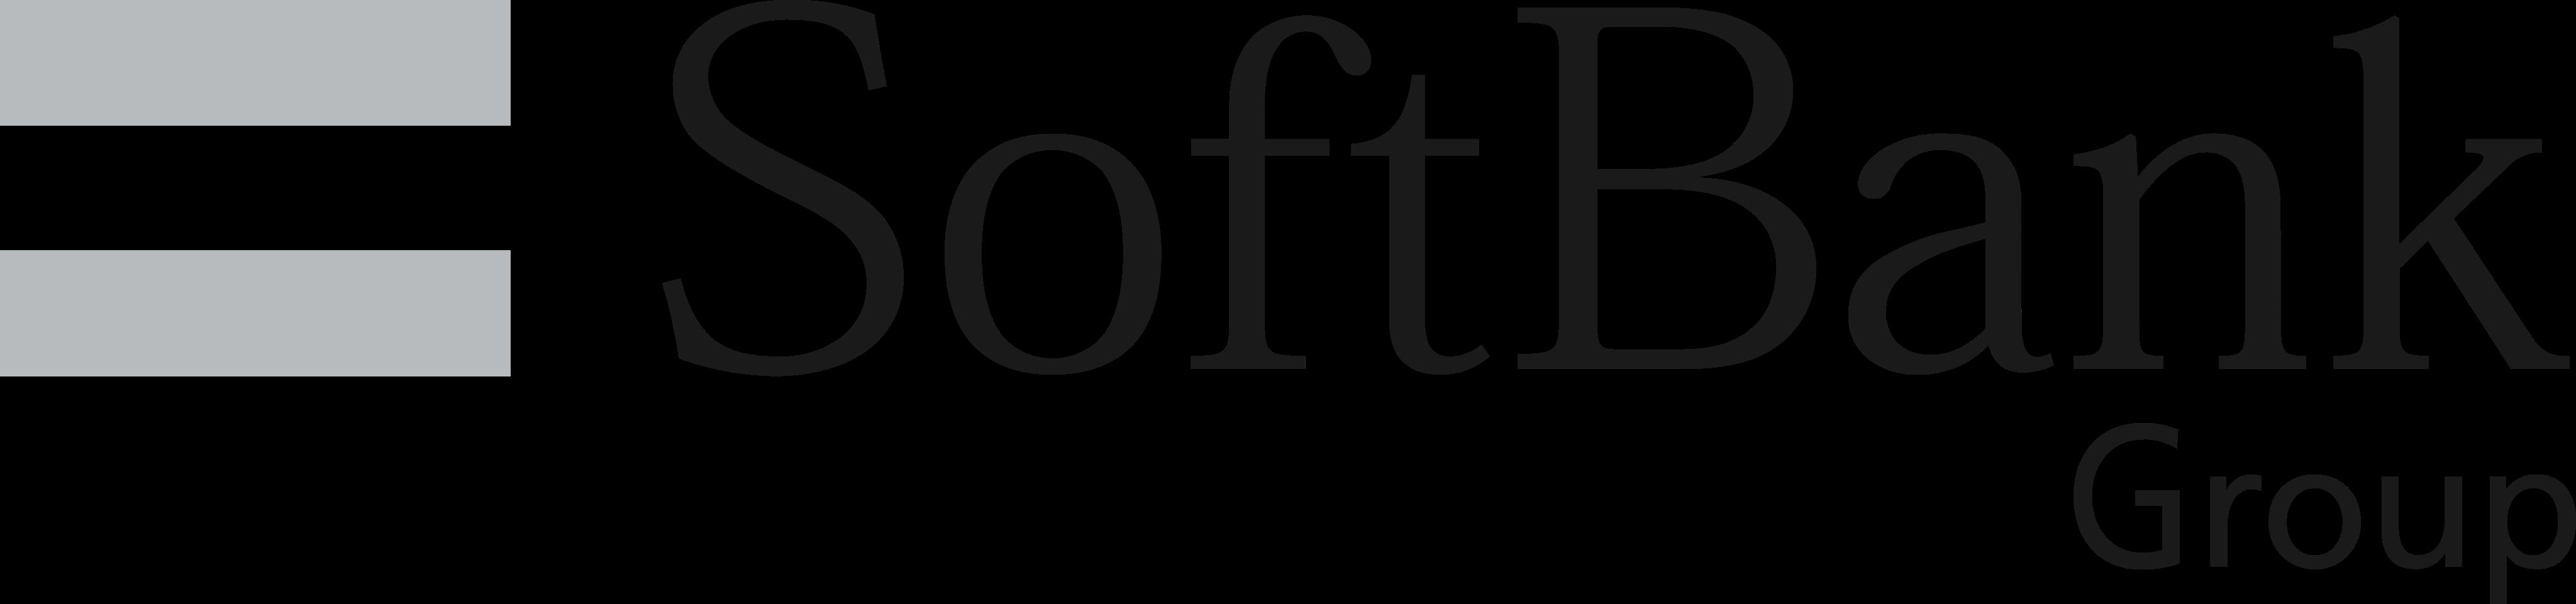 softbank logo 1 - SoftBank Logo